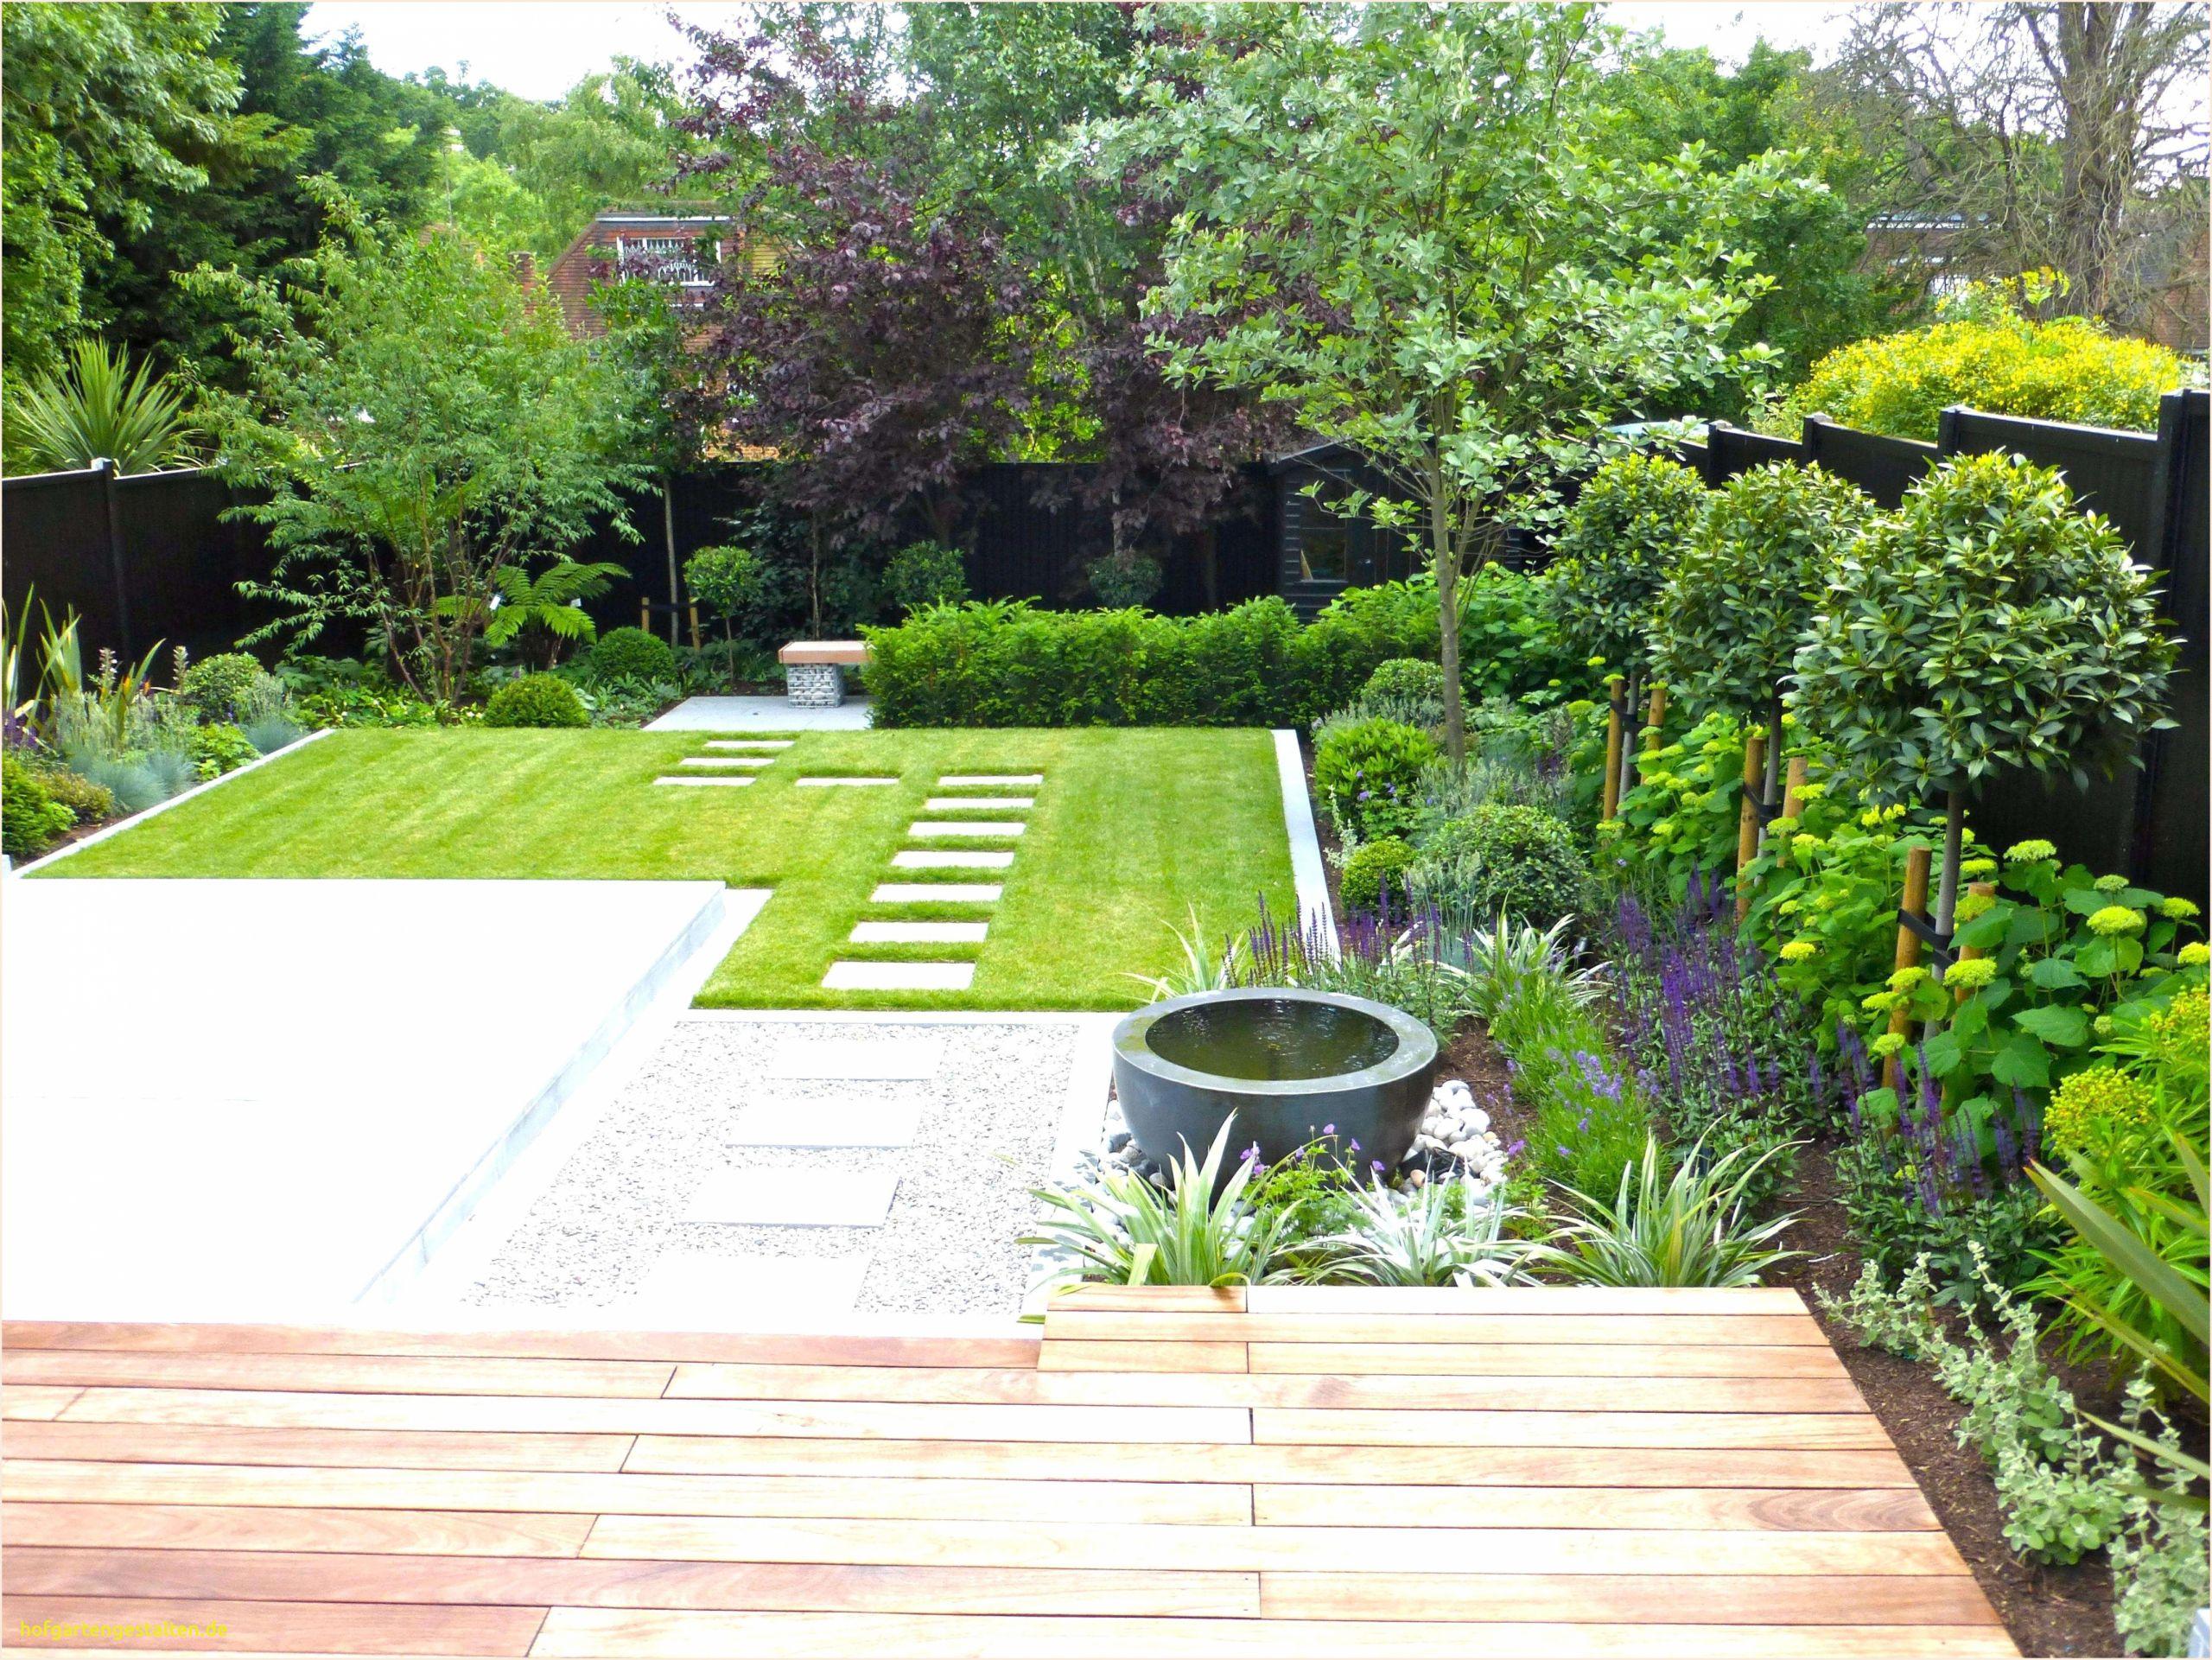 Garten Dekorieren Ideen Inspirierend Deko Garten Selber Machen — Temobardz Home Blog